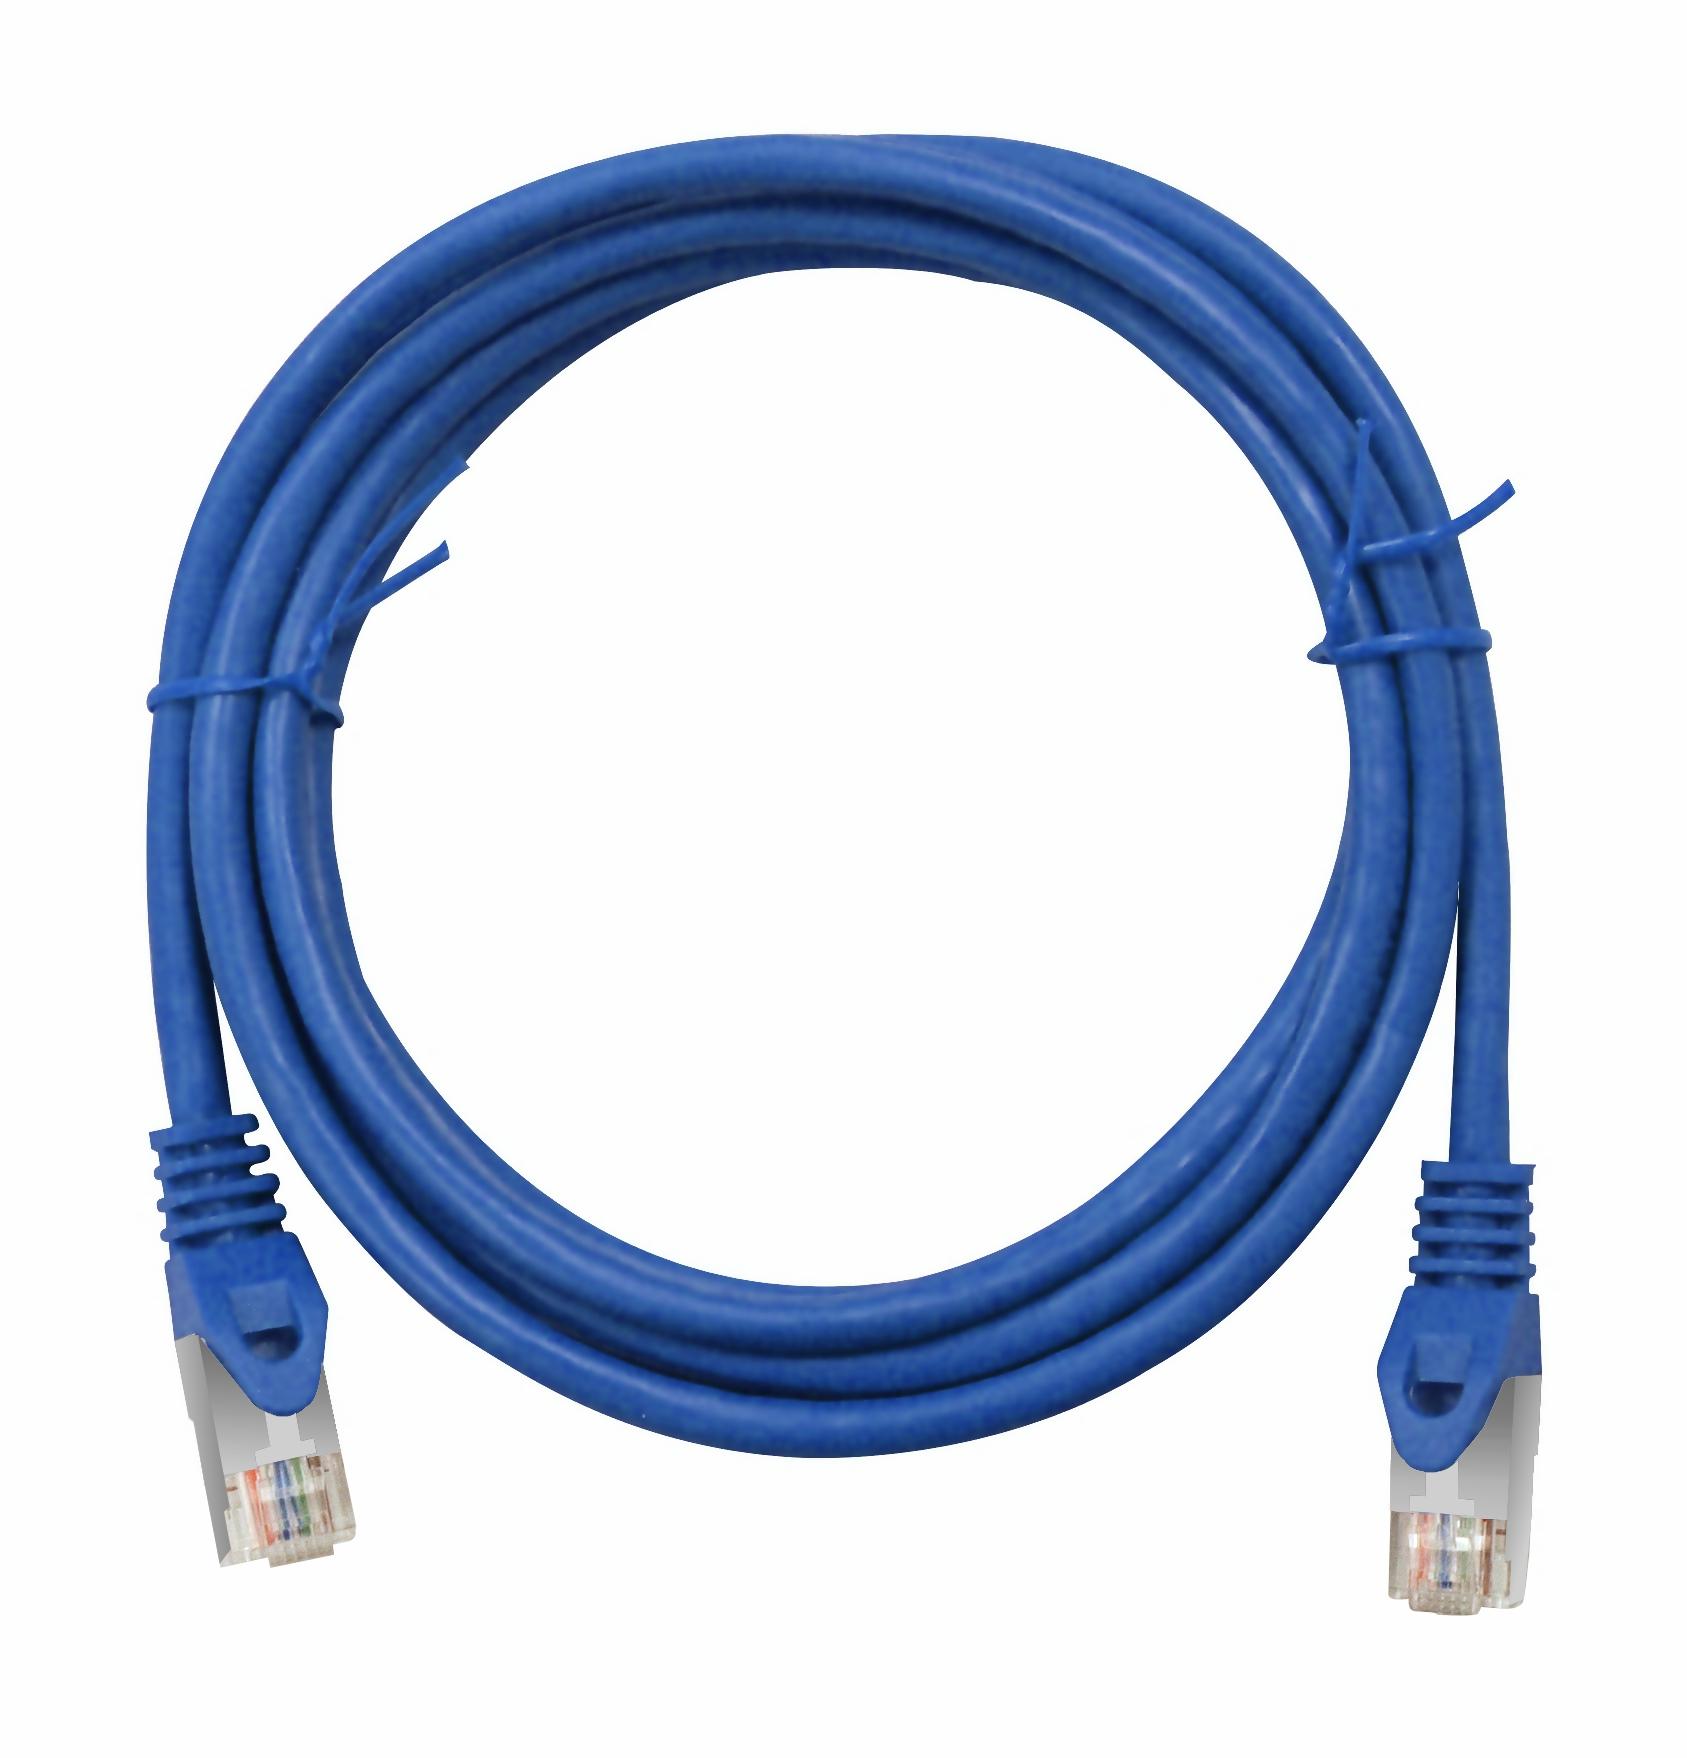 1 Stk Patchkabel RJ45 geschirmt Cat.6, PVC, blau, 3,0m H6GLB03K0B